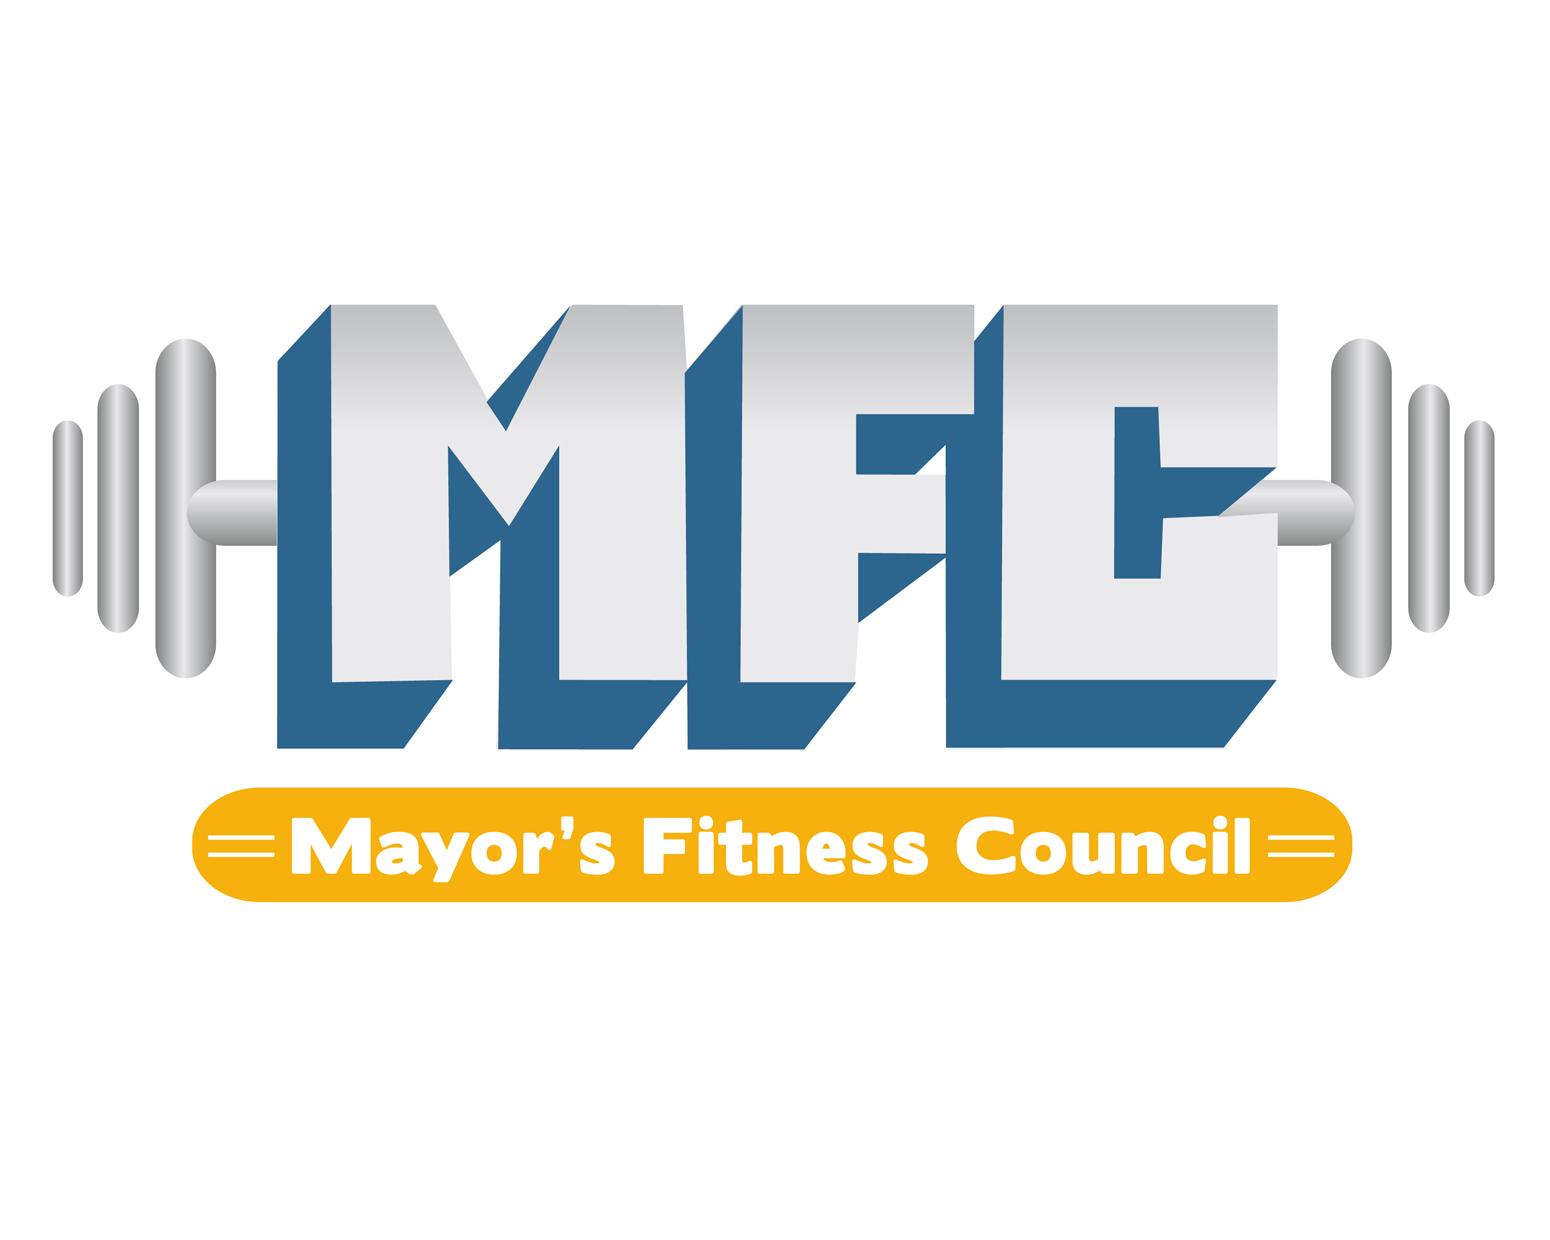 Mayor's Fitness Council